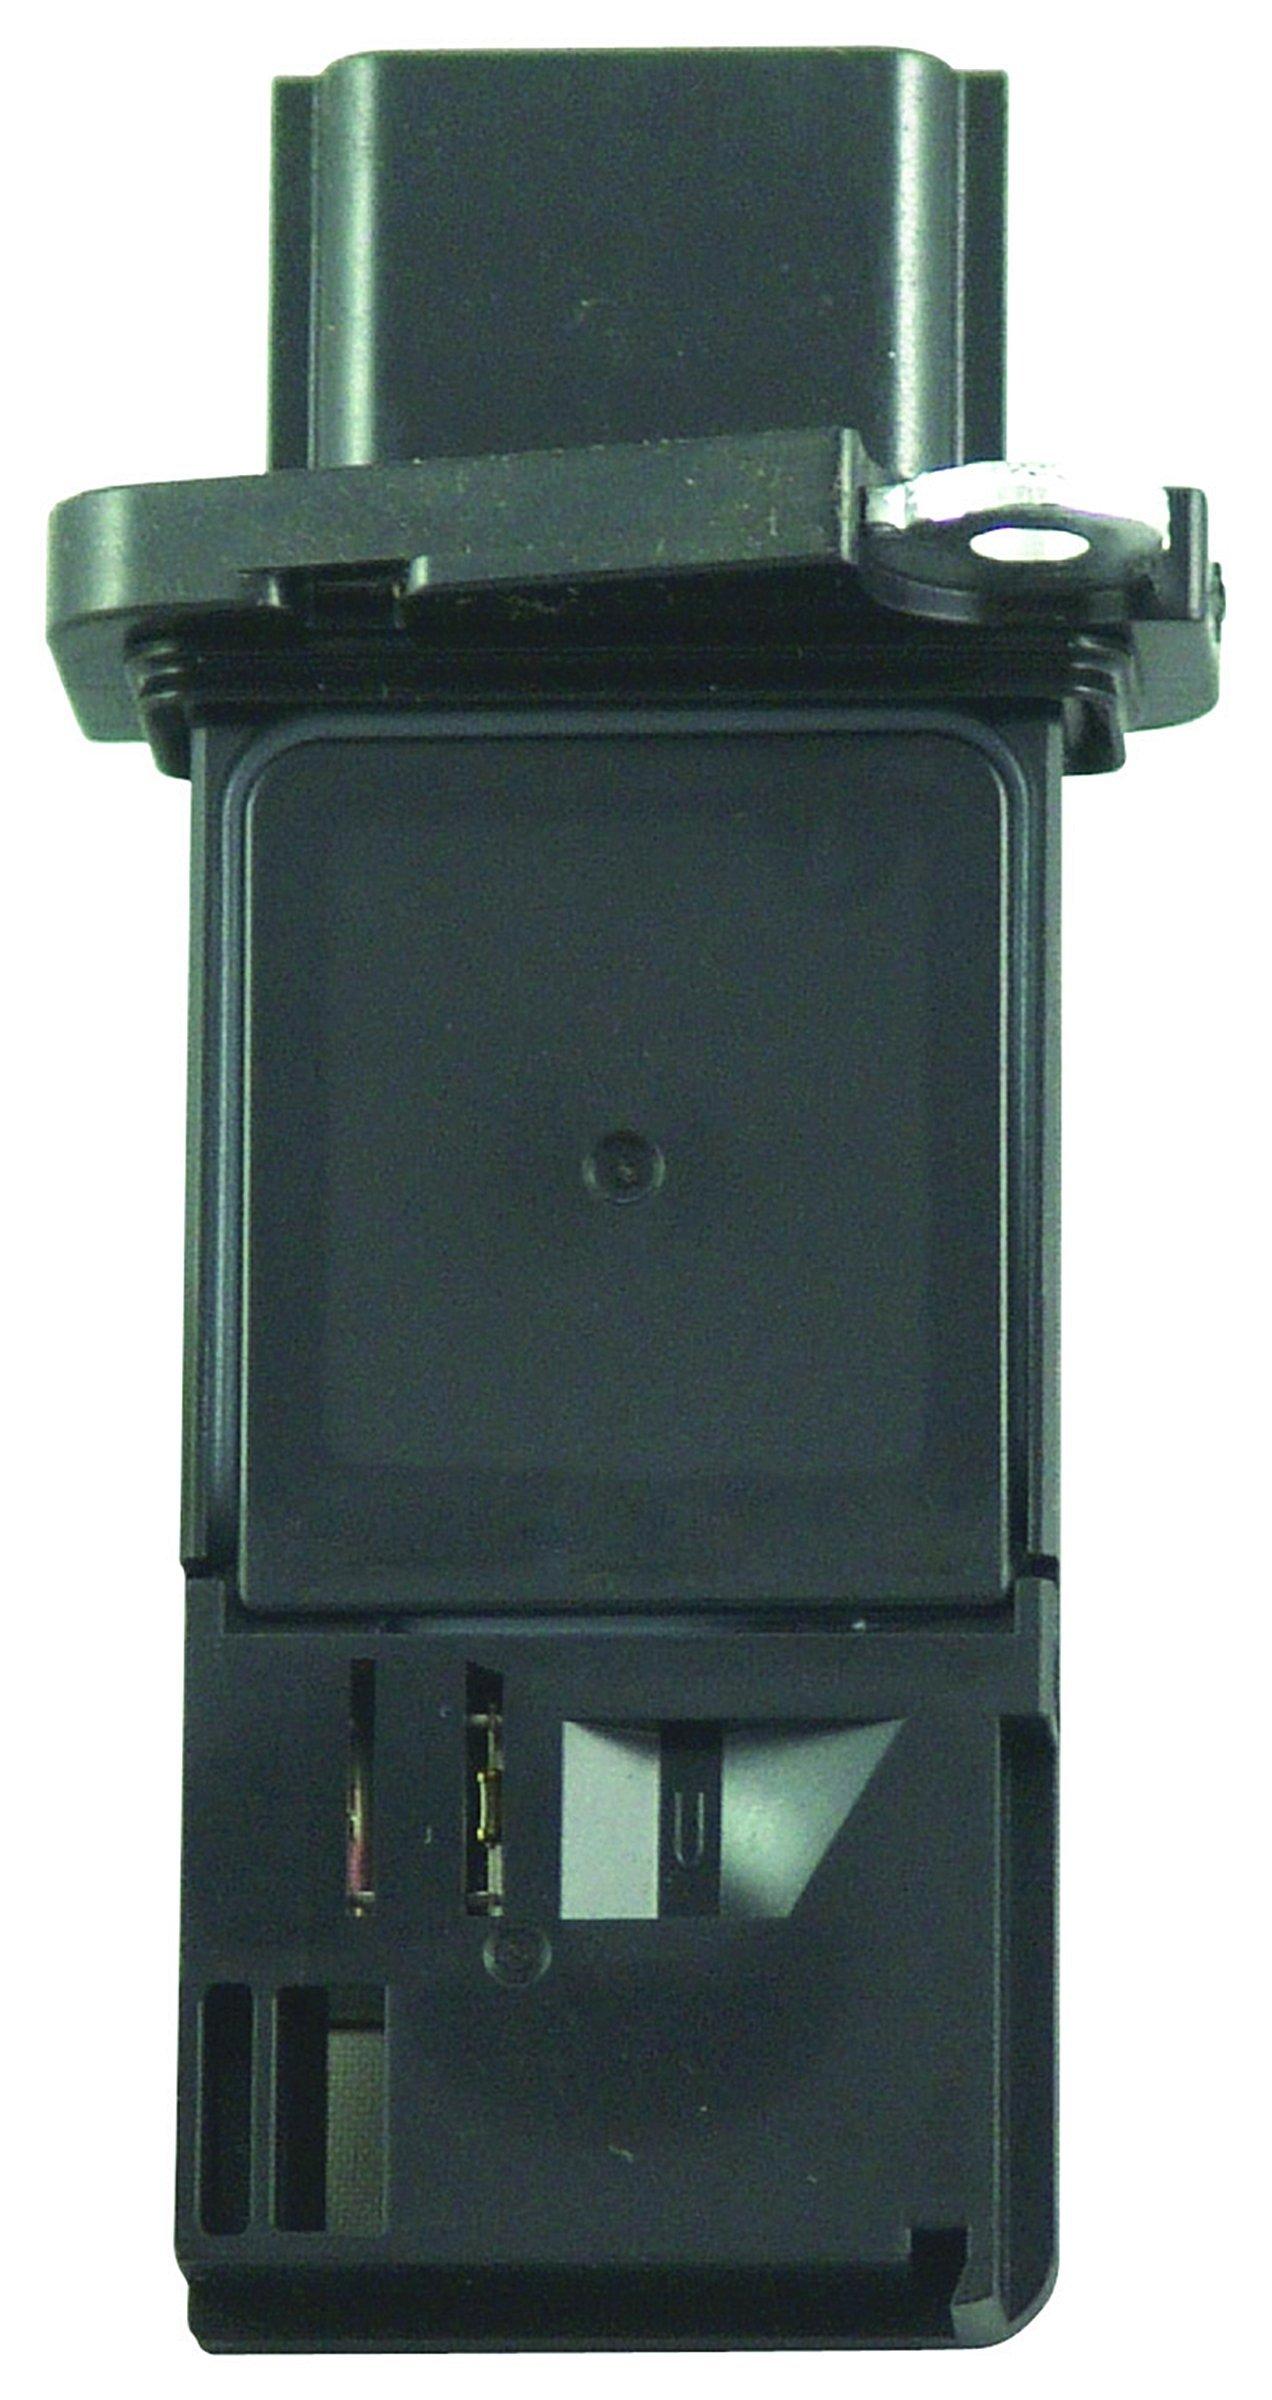 Hitachi MAF0031 Emission Sensors/Valves